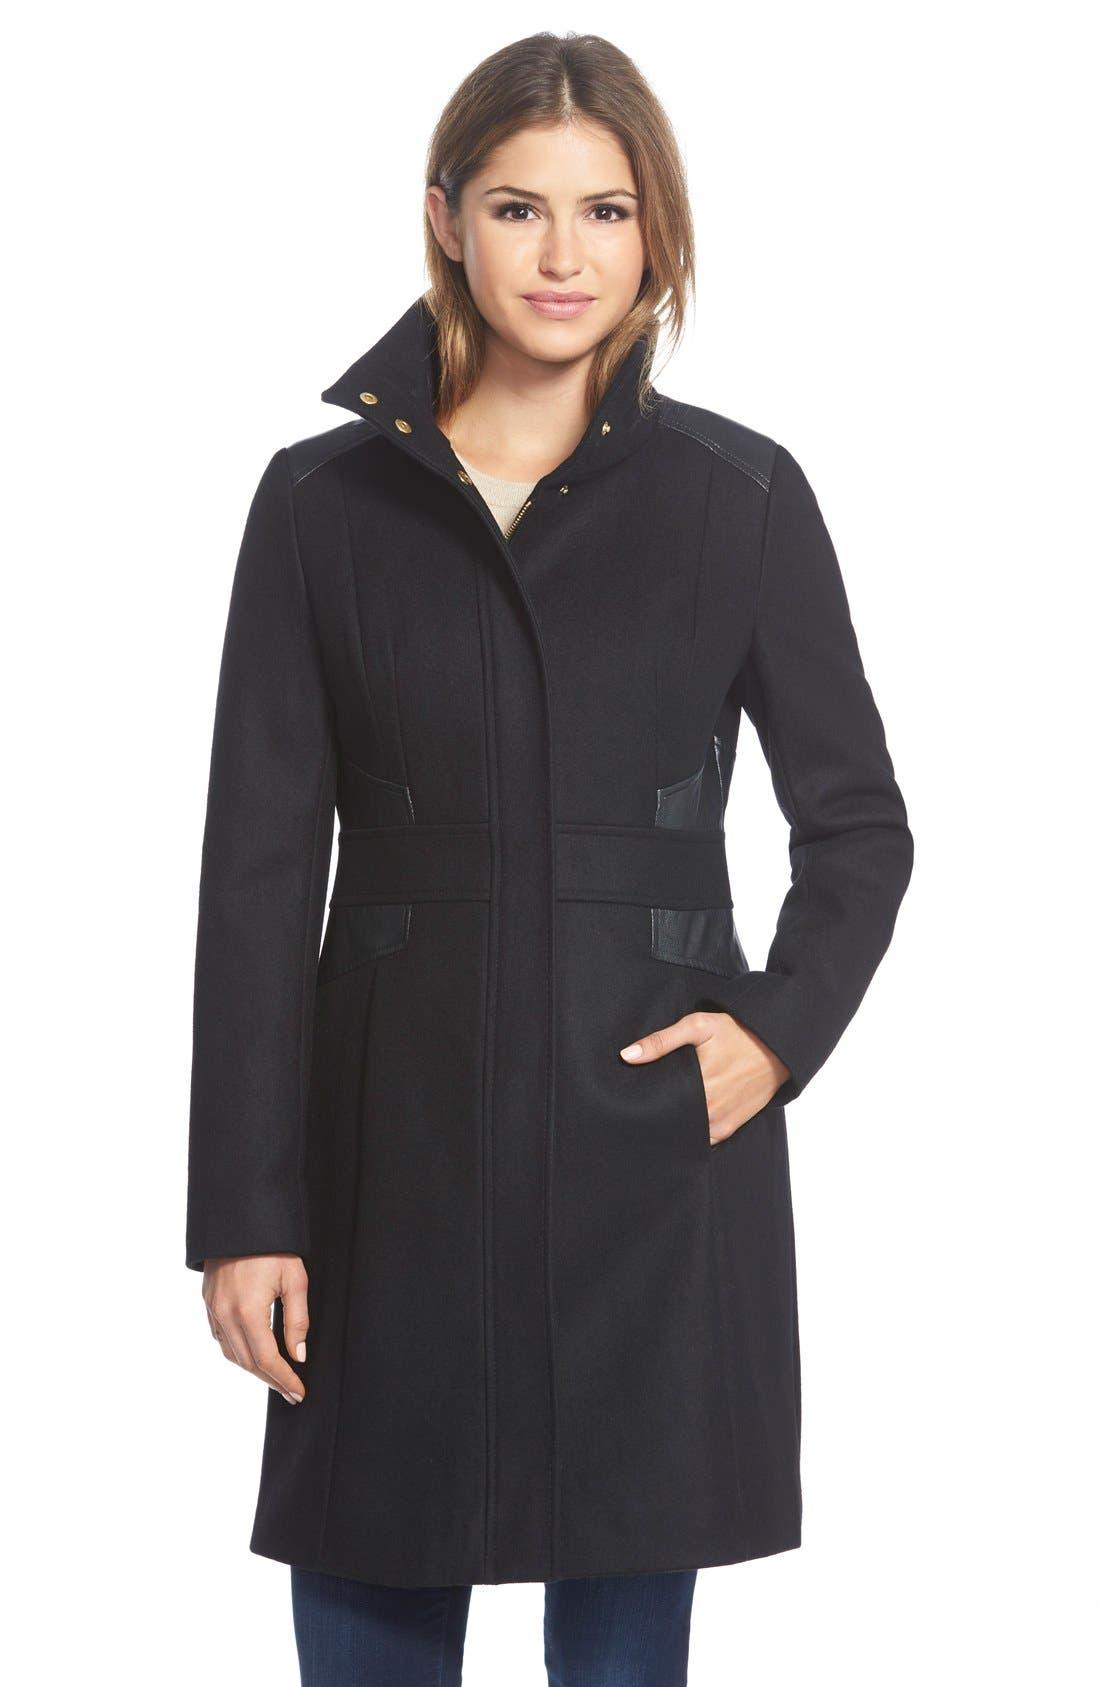 Main Image - Via Spiga Wool Blend Coat with Faux Leather Trim (Regular & Petite)